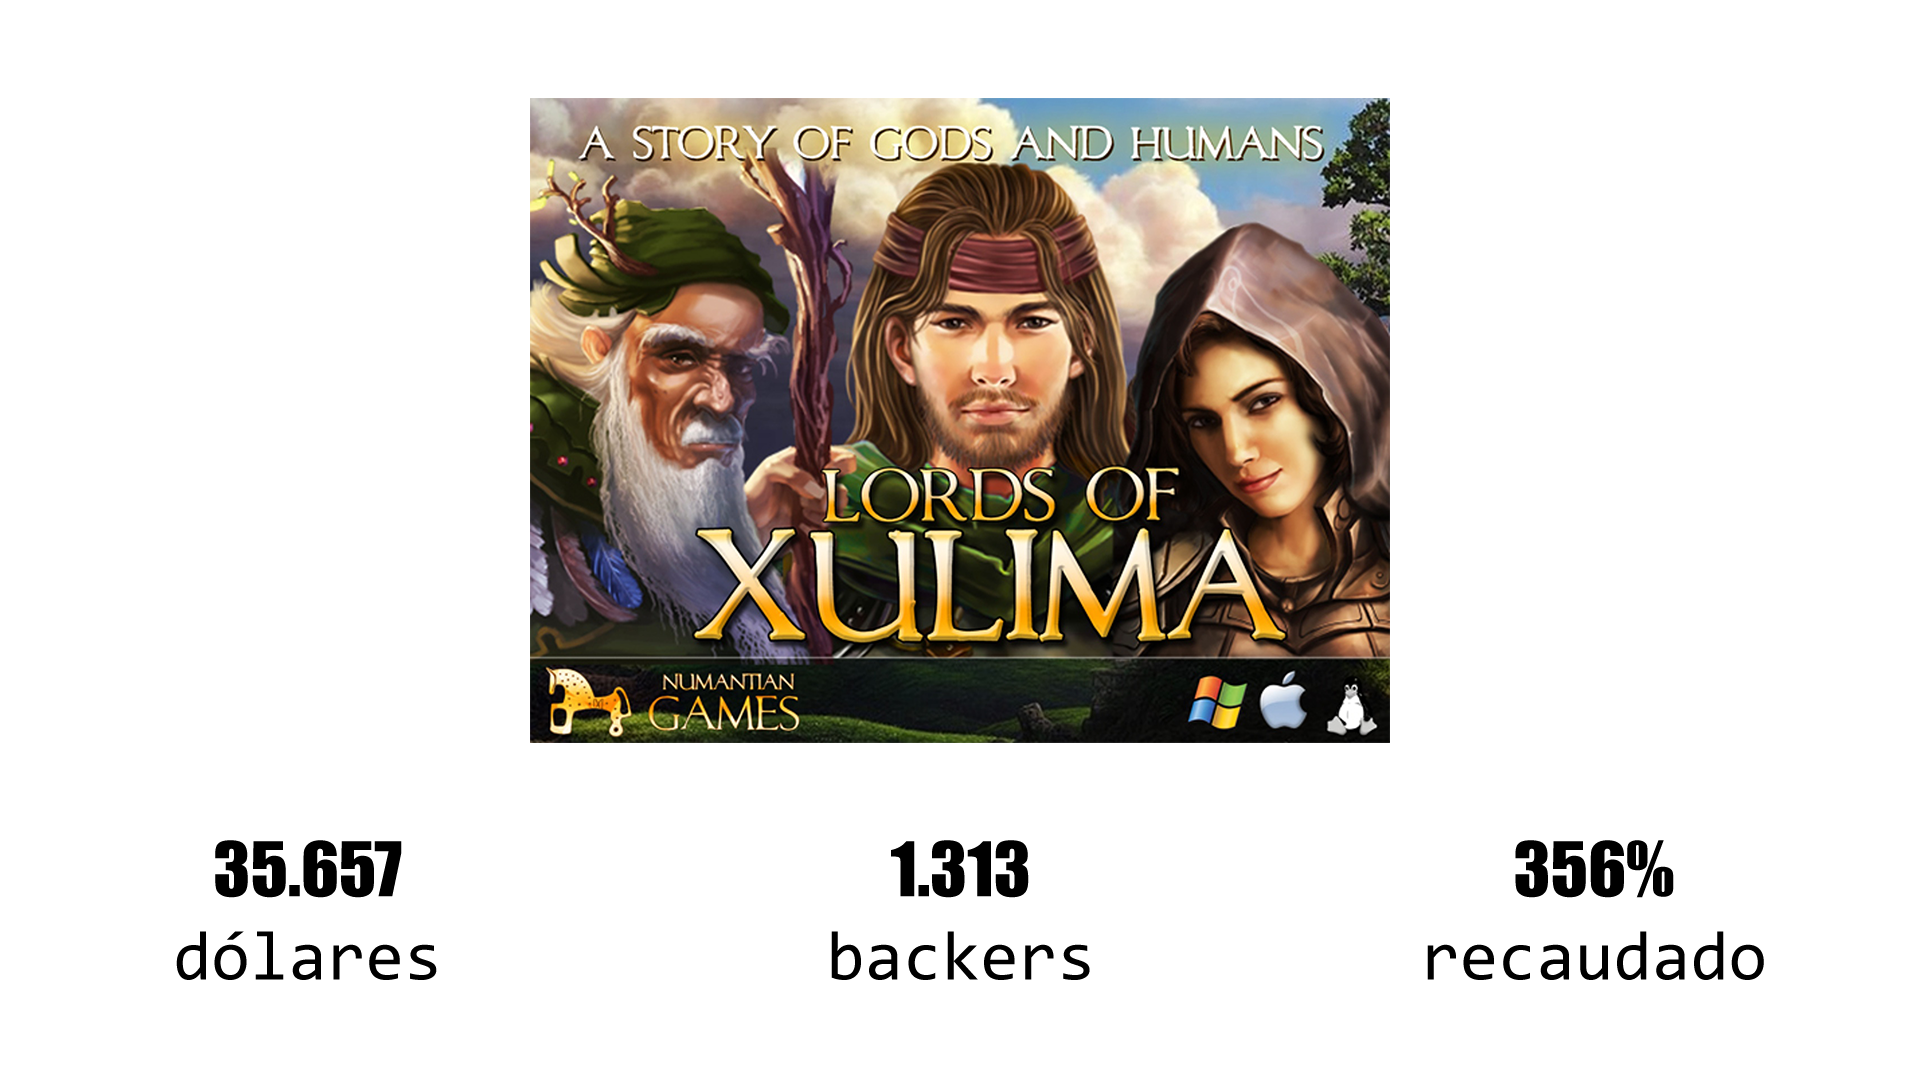 lords of xulima proyecto kickstarter españa SYBIC crowdfunding